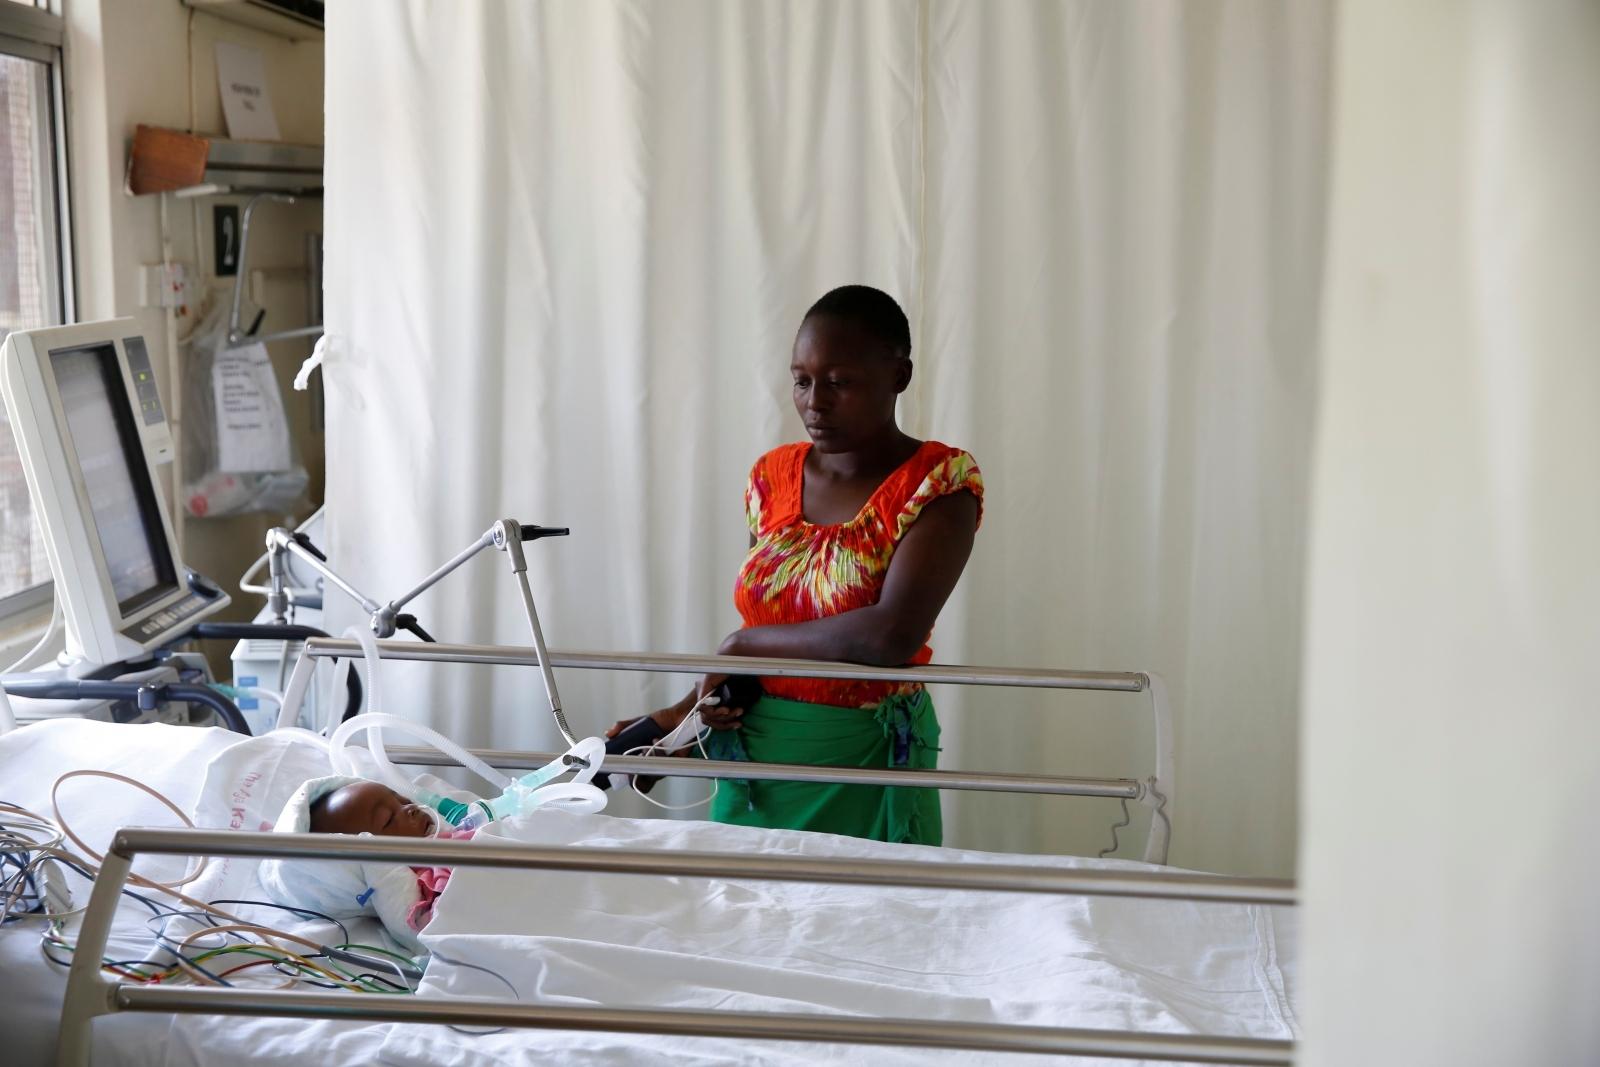 Child beaten by police in Kenya